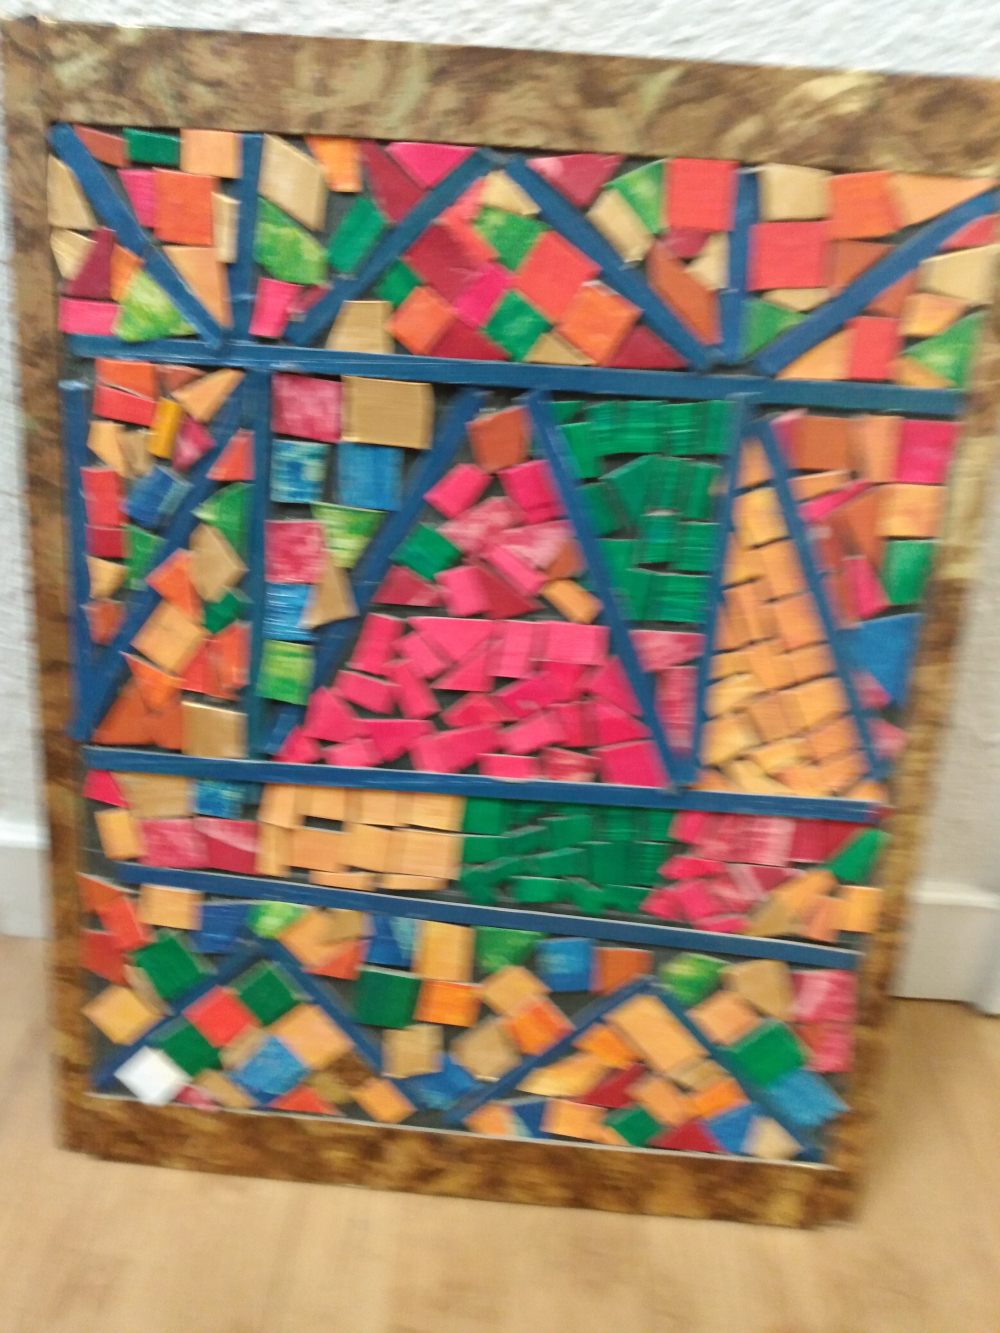 3rd. Zerene Soans, Trash to treasure. Mosaic